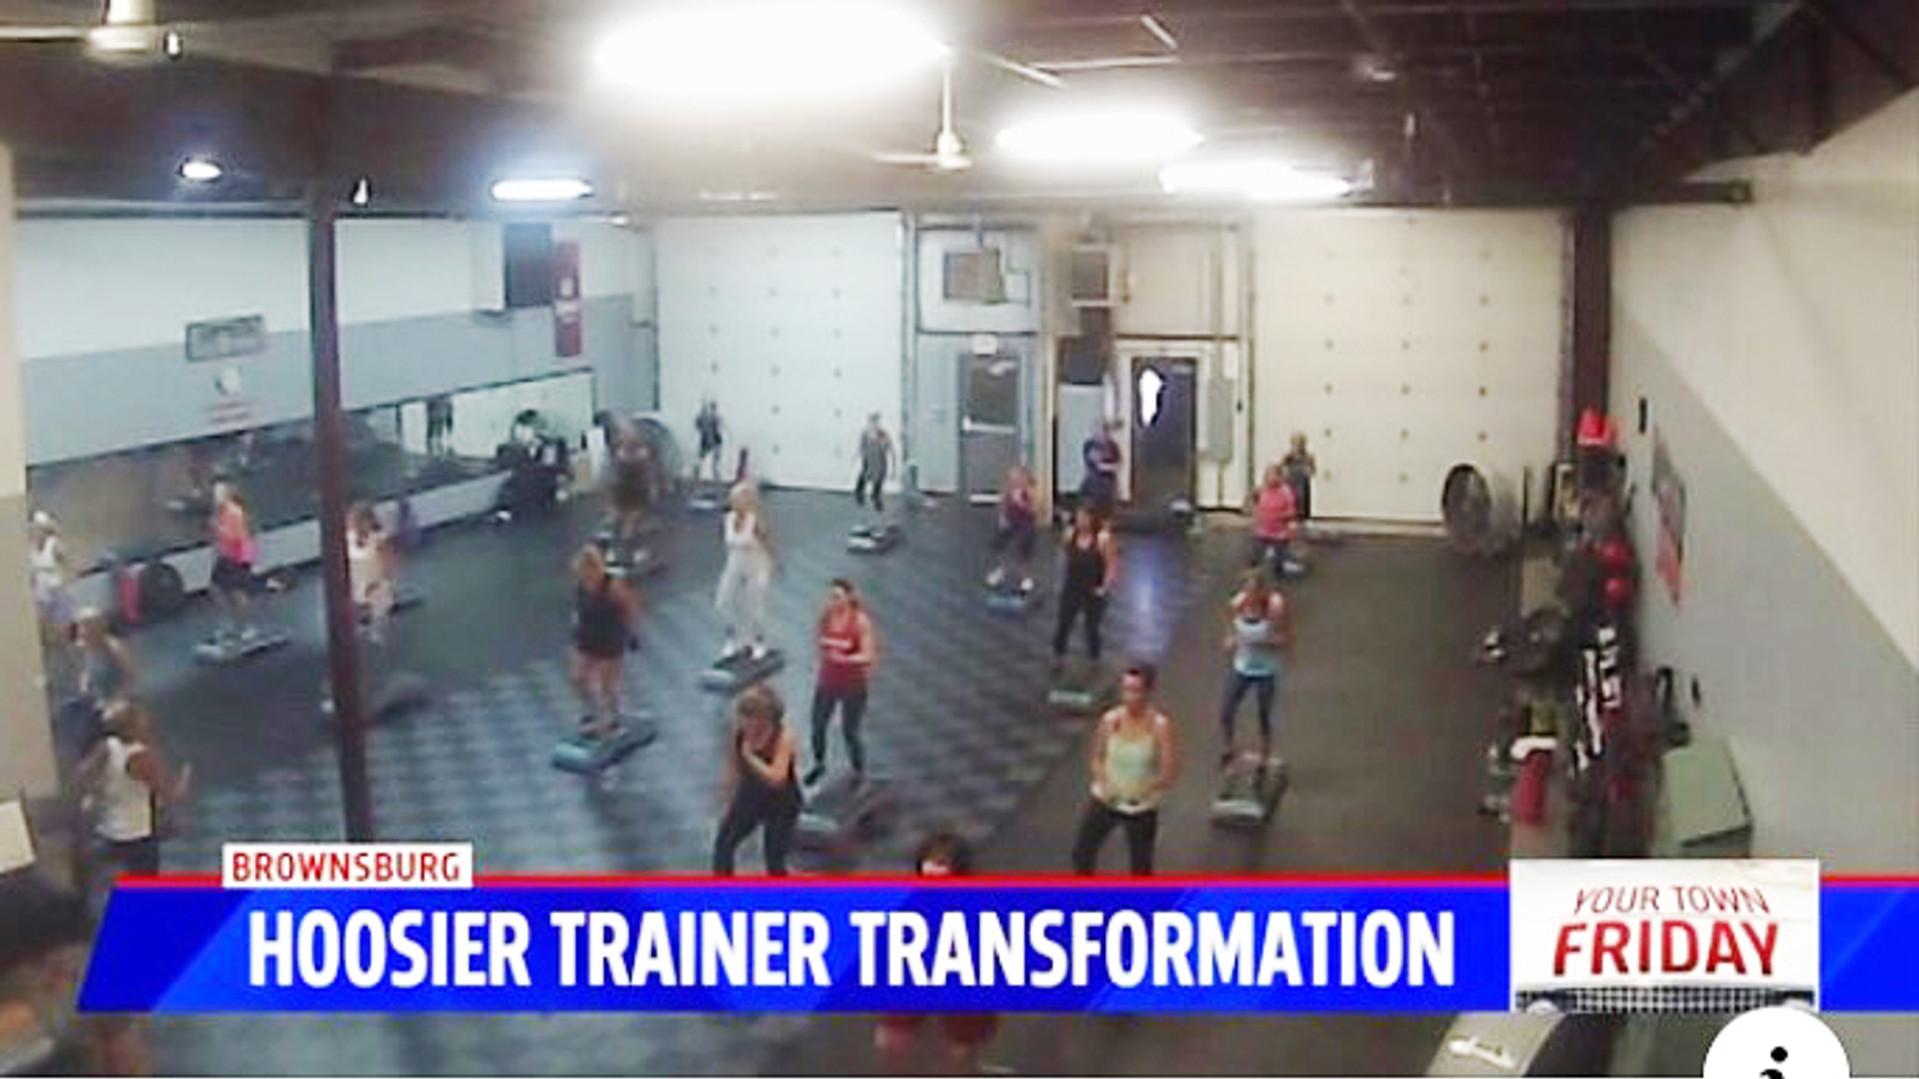 Hoosier Trainer on the News